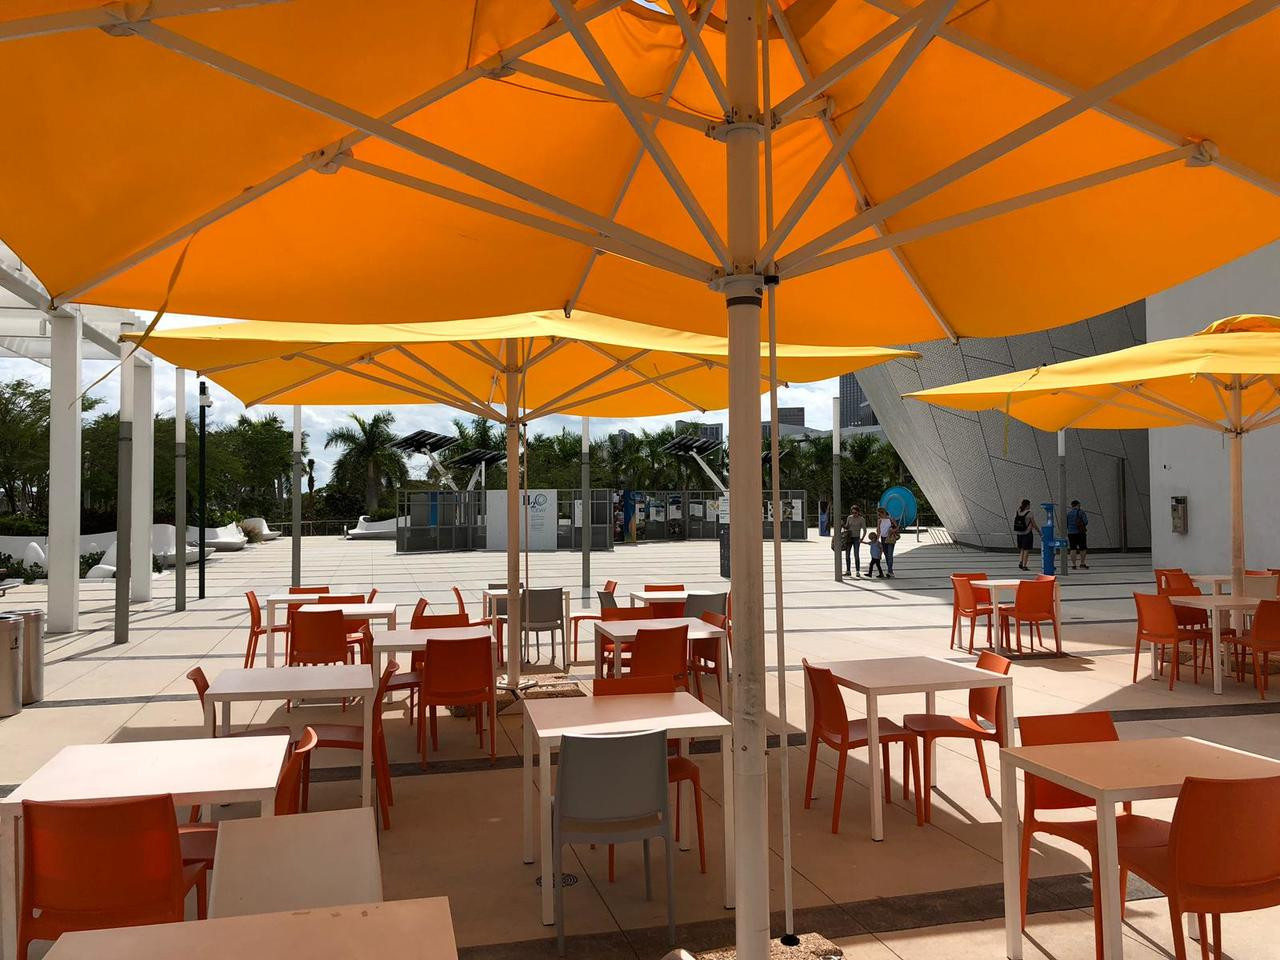 capri giant telescopic umbrella base 16 x16 or 20 x20